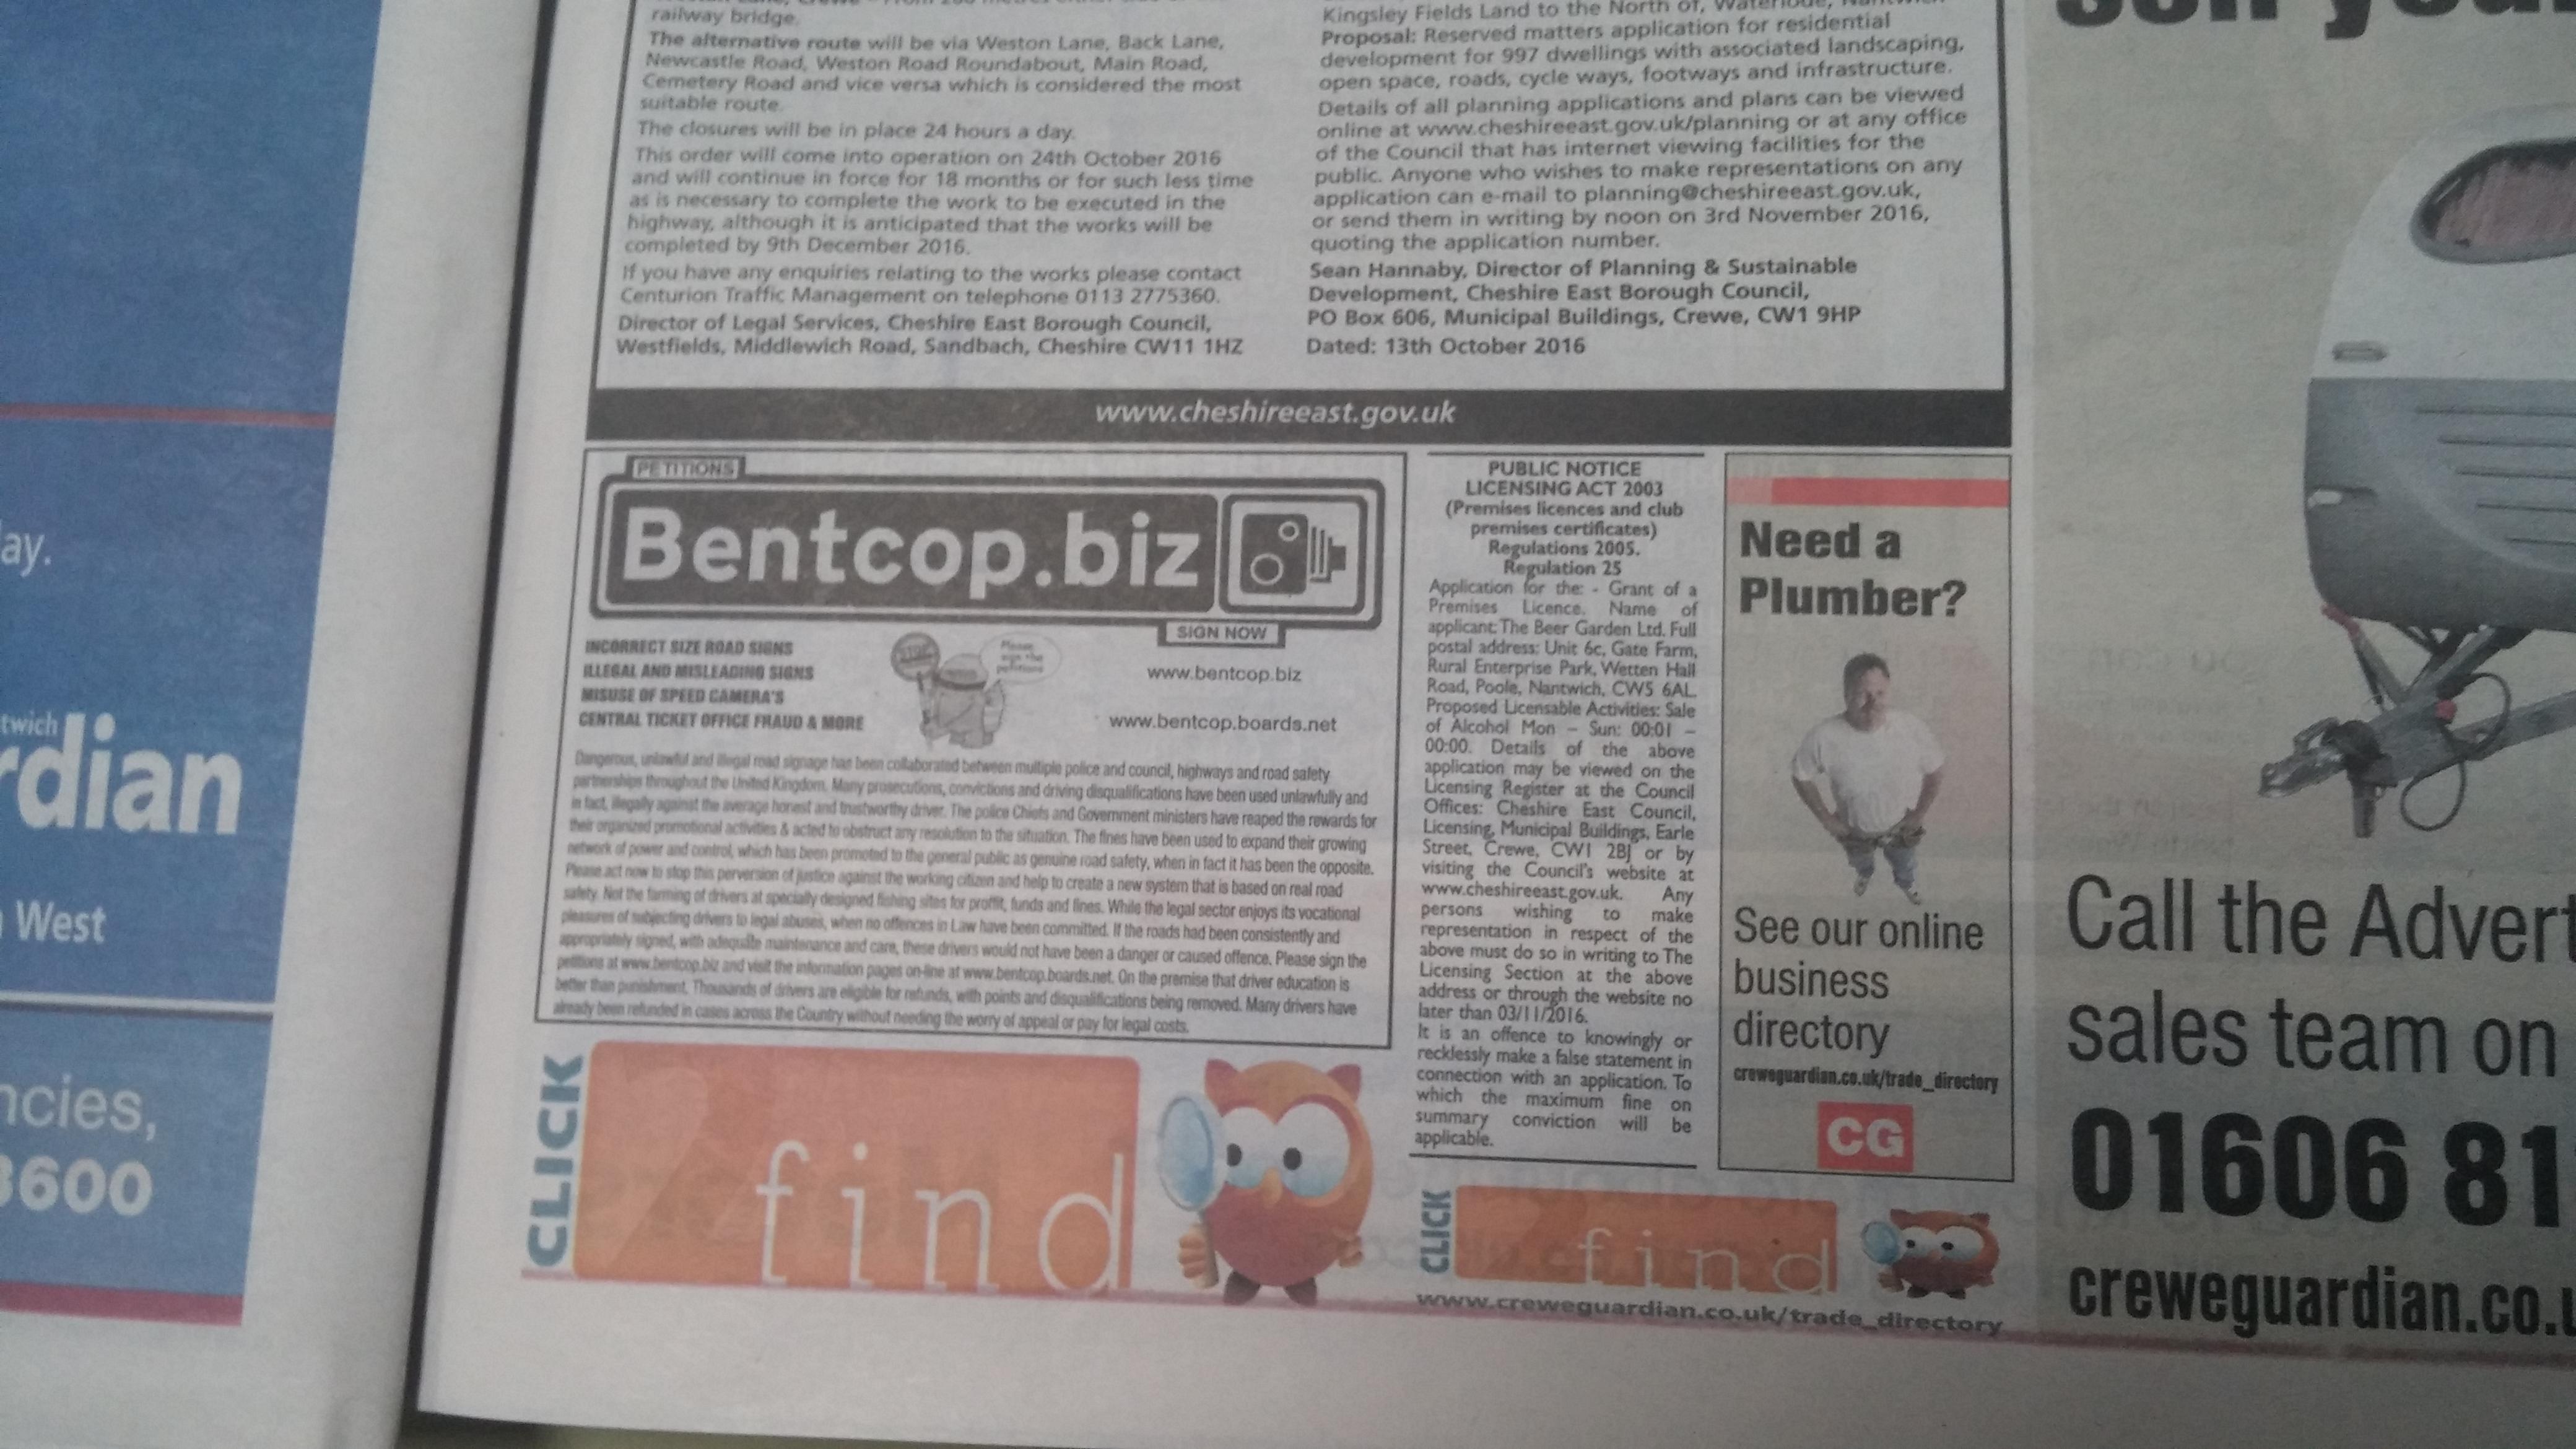 http://www.bentcop.biz/30.266.jpg